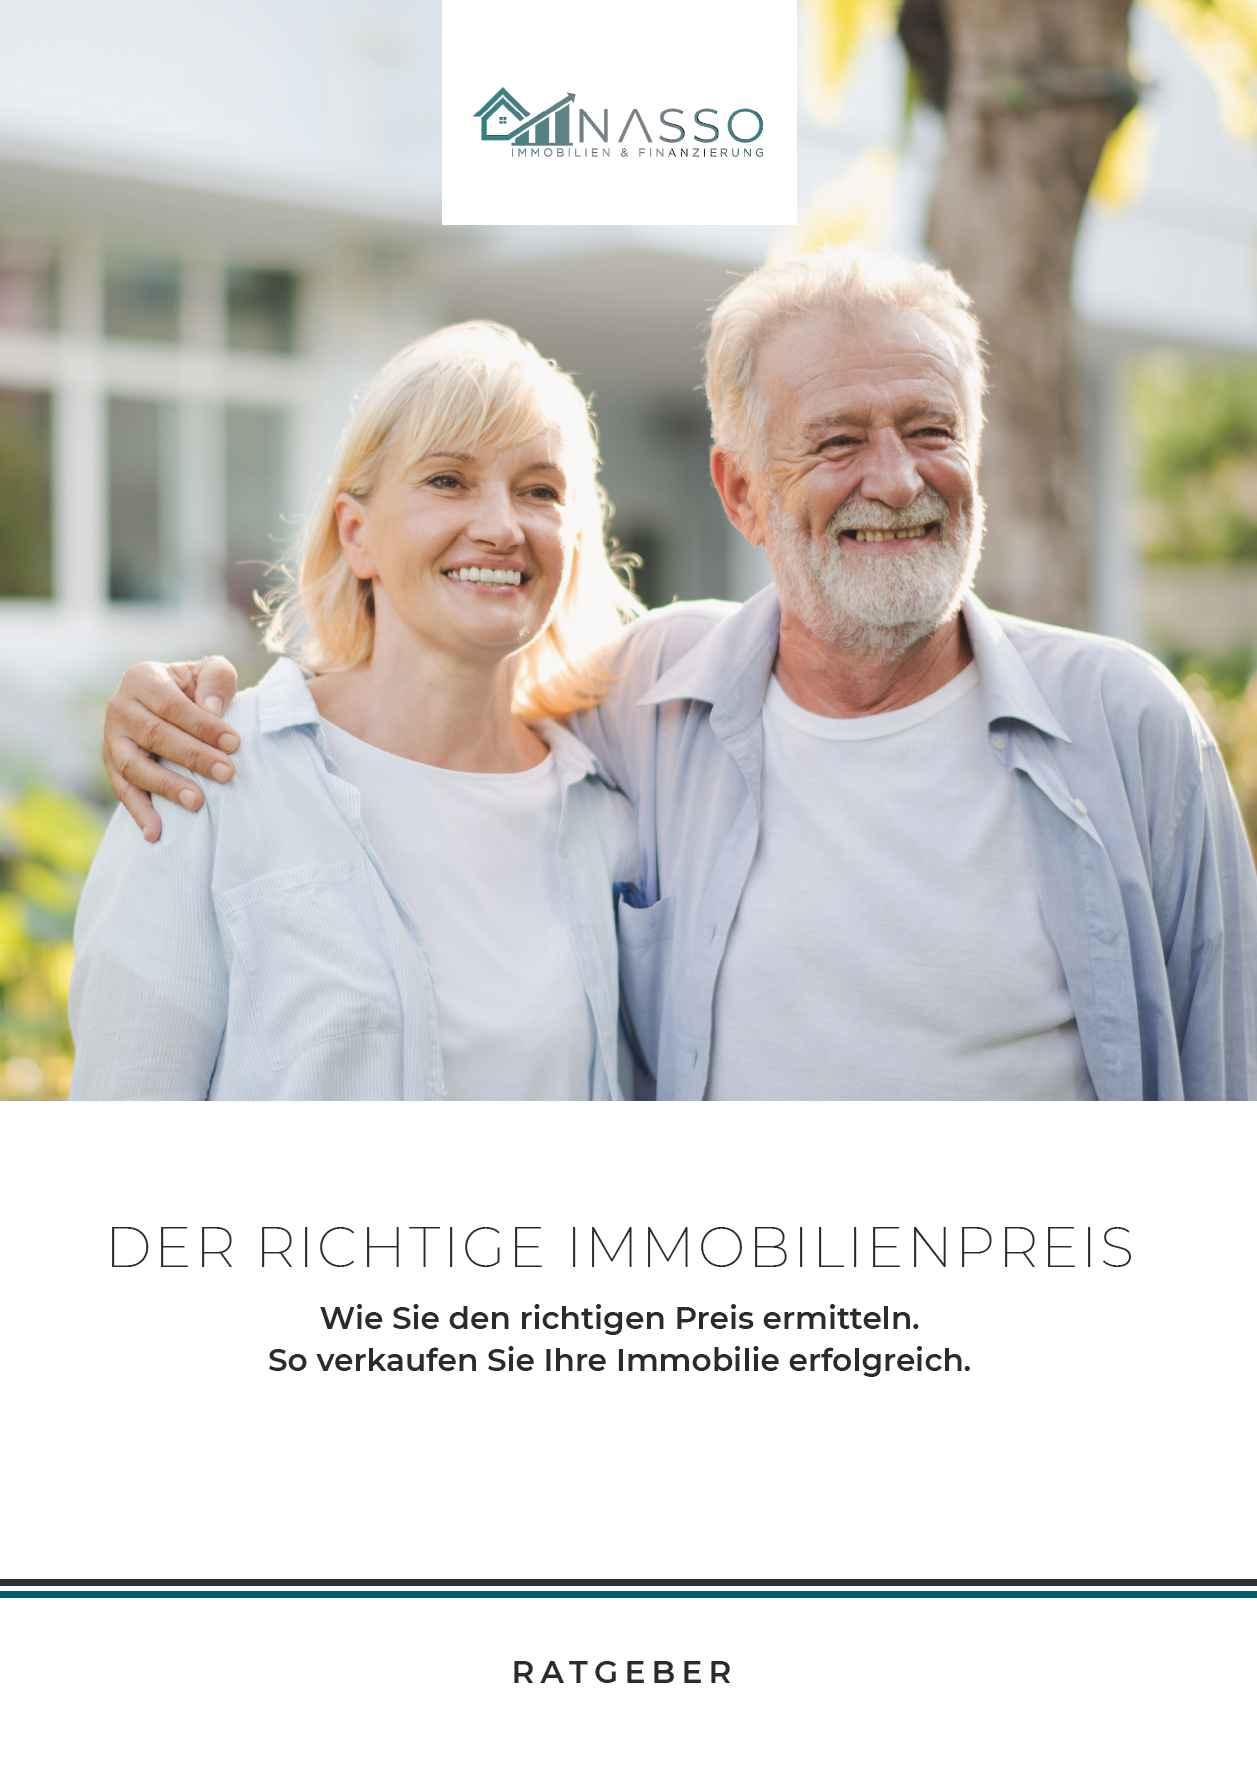 immonasso-ratgeber-cover-richtiger-immobilienpreis